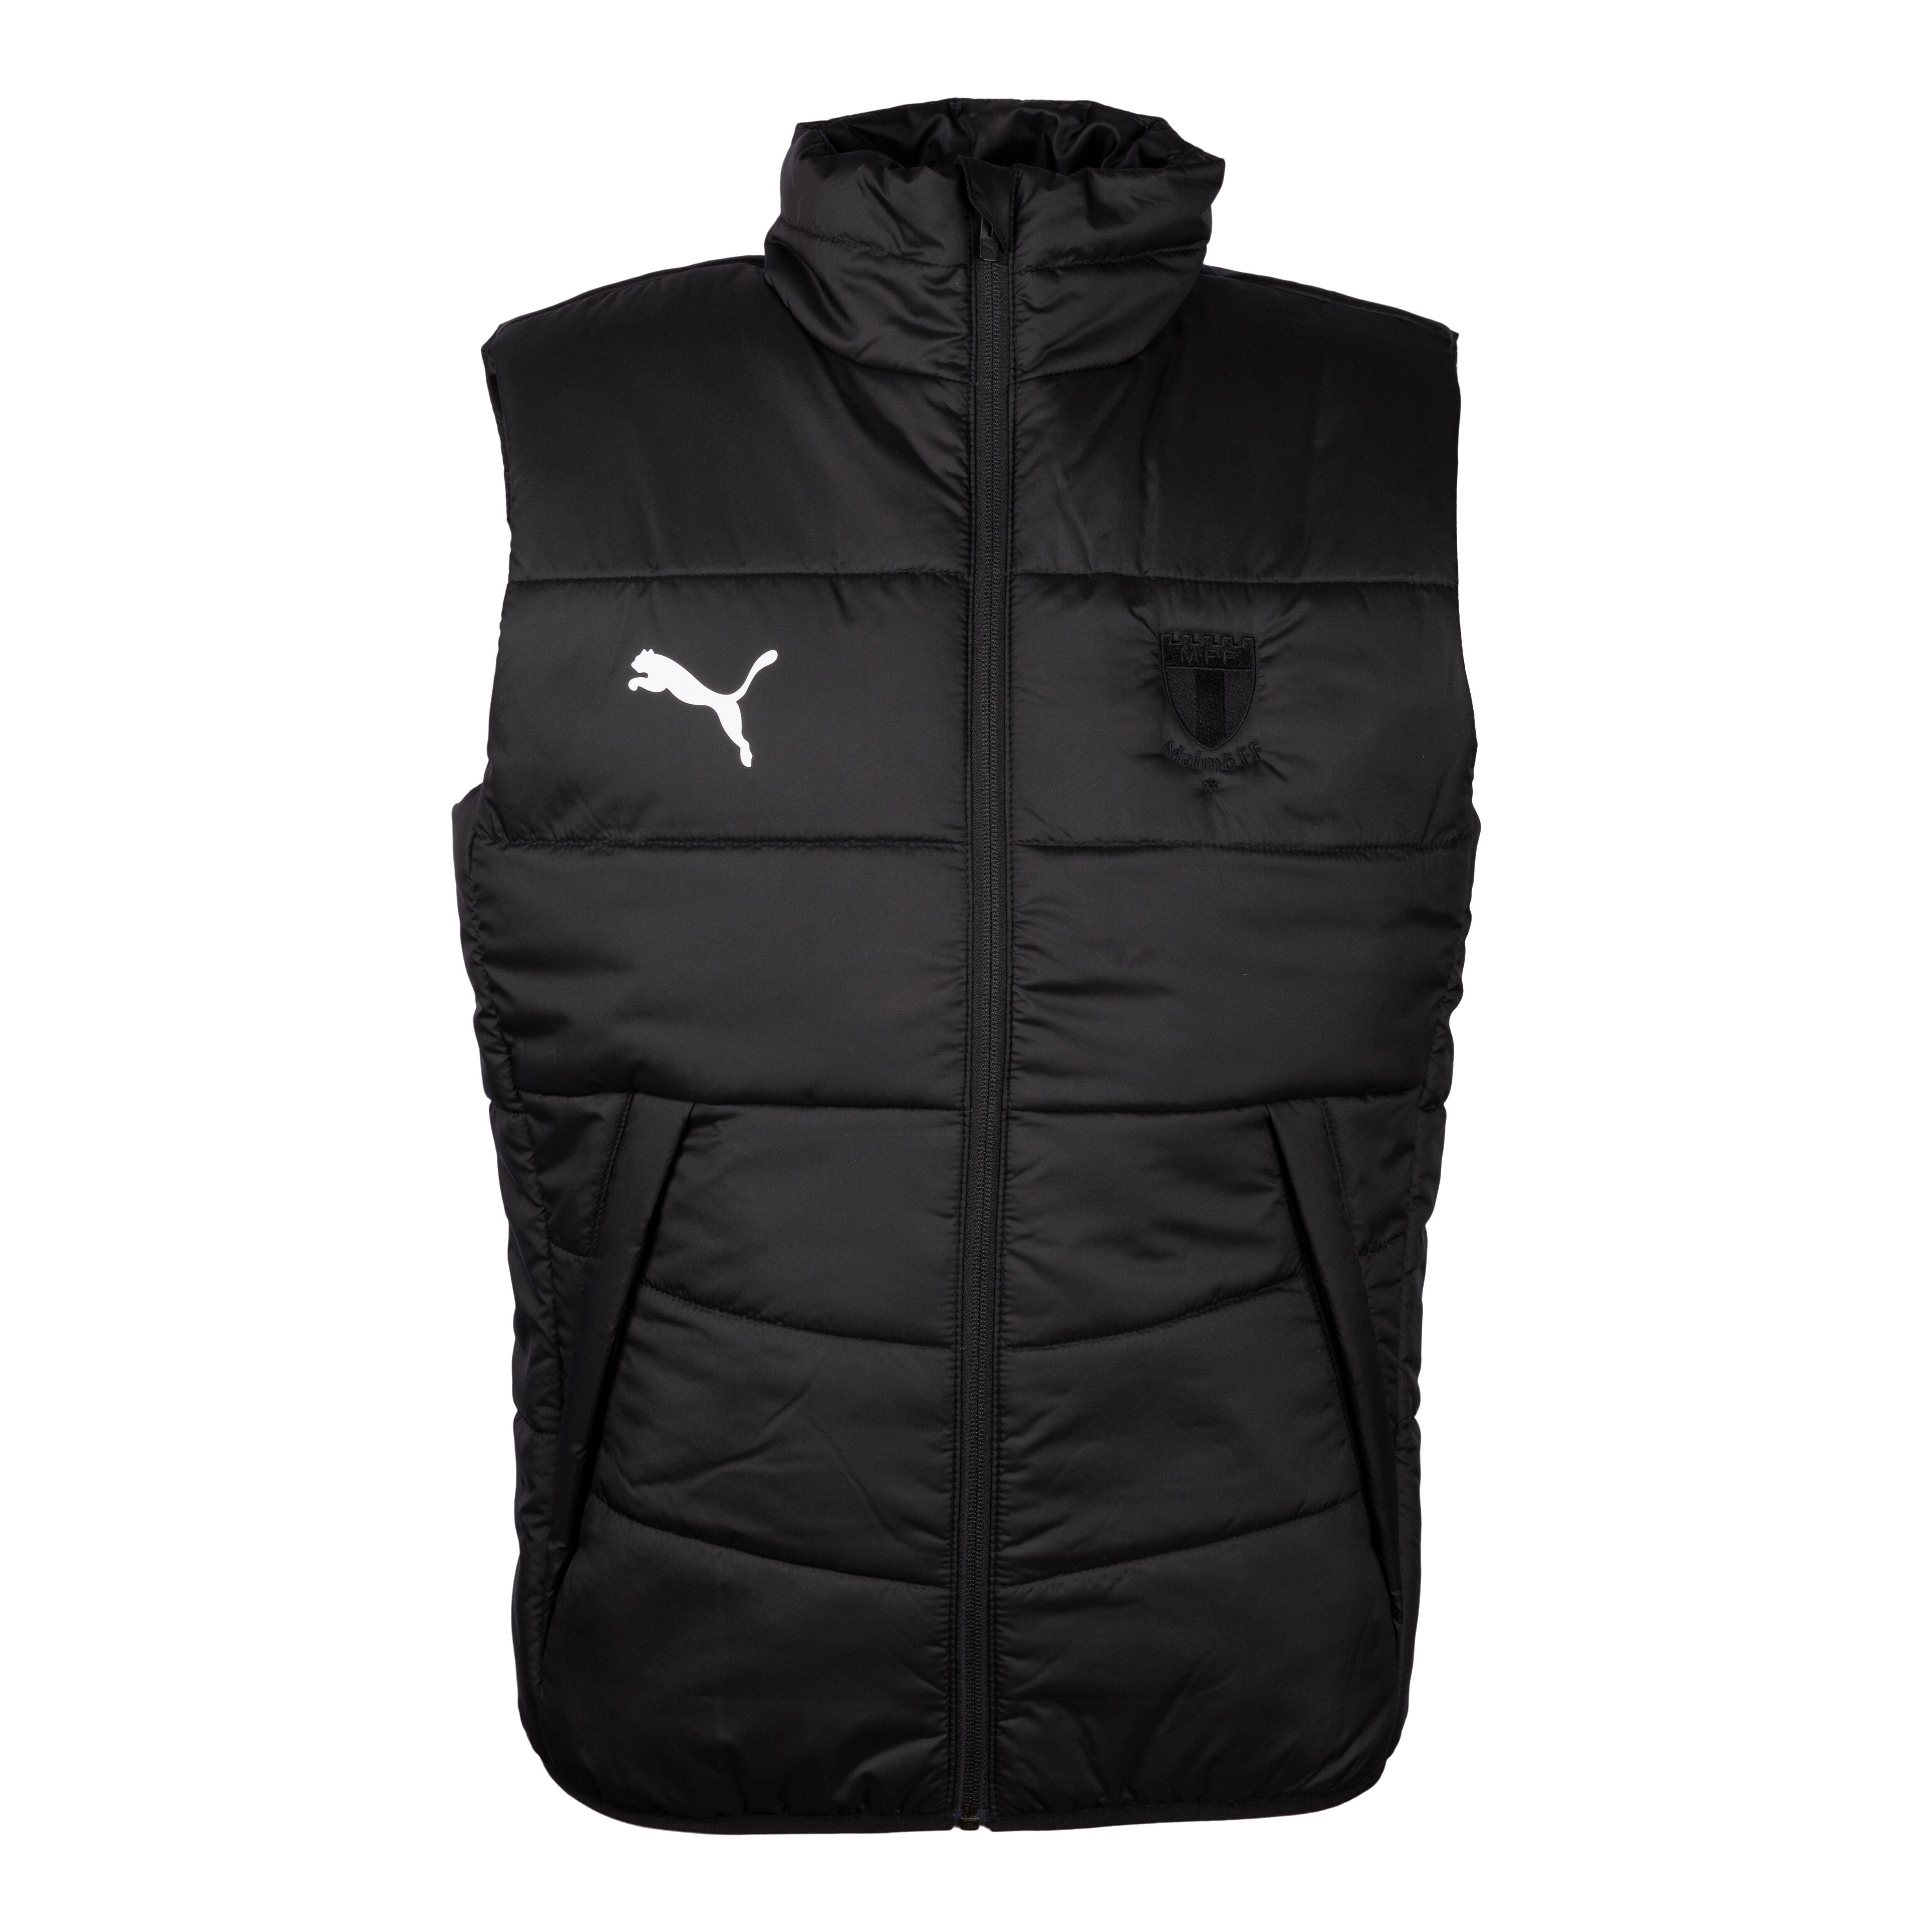 Puma padded vest